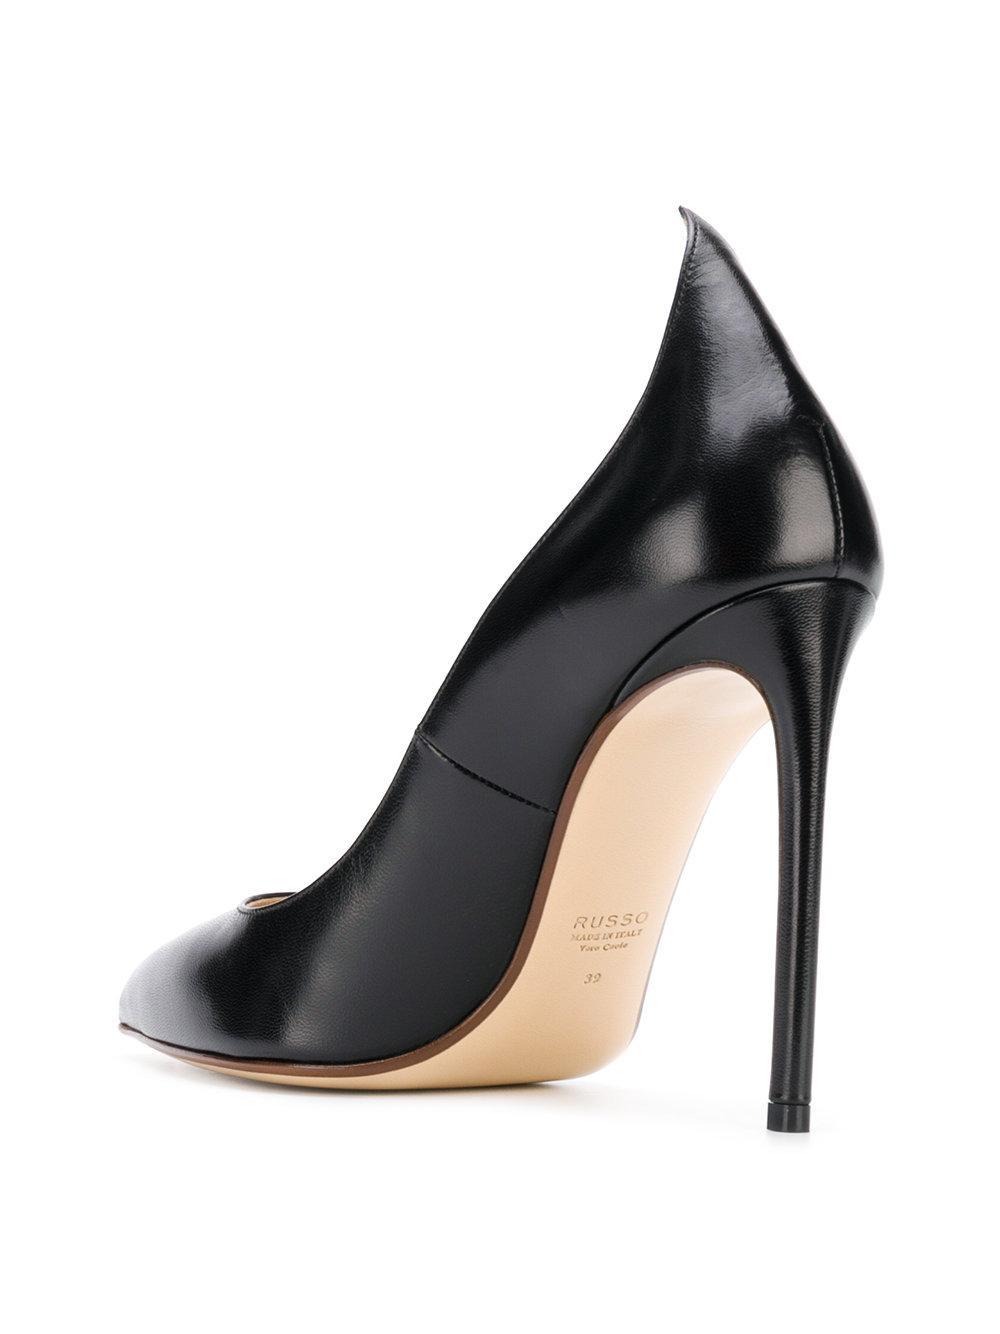 516c6ecc5f1b Francesco Russo - Black Pointed Heel Pumps - Lyst. View fullscreen